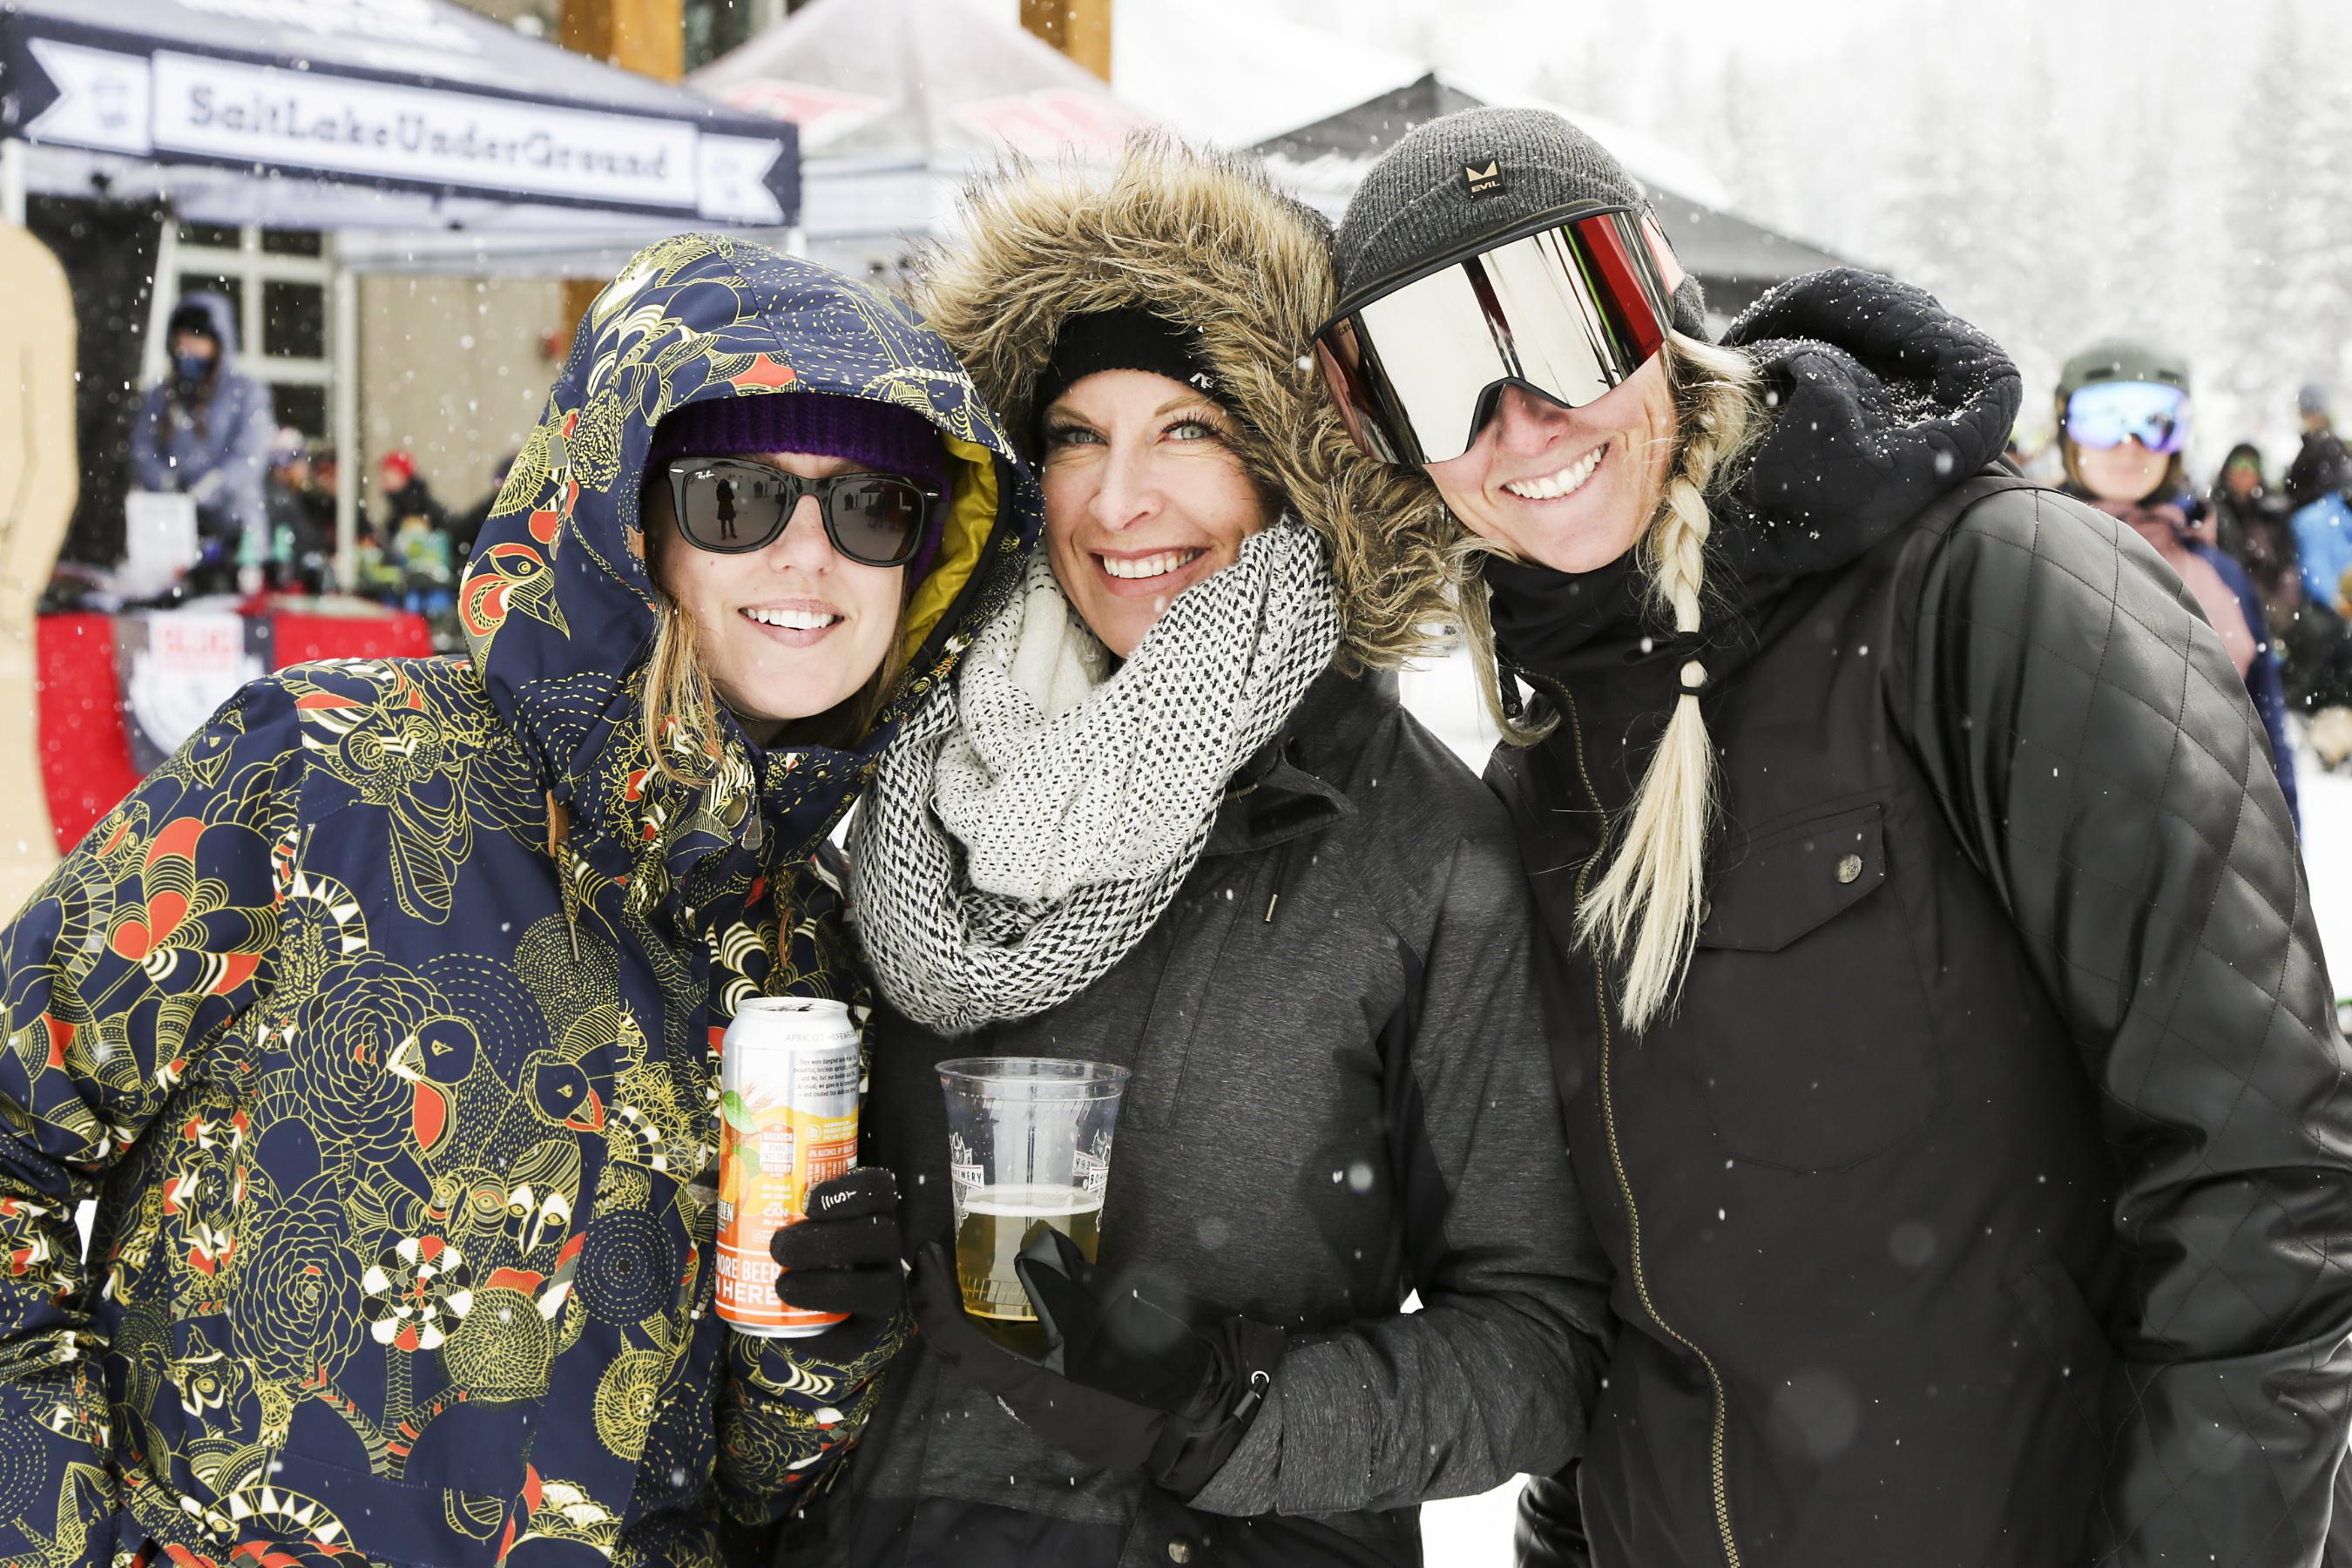 Jessica Singer, Amy Hawkins, and Ashley park all enjoying the fun.